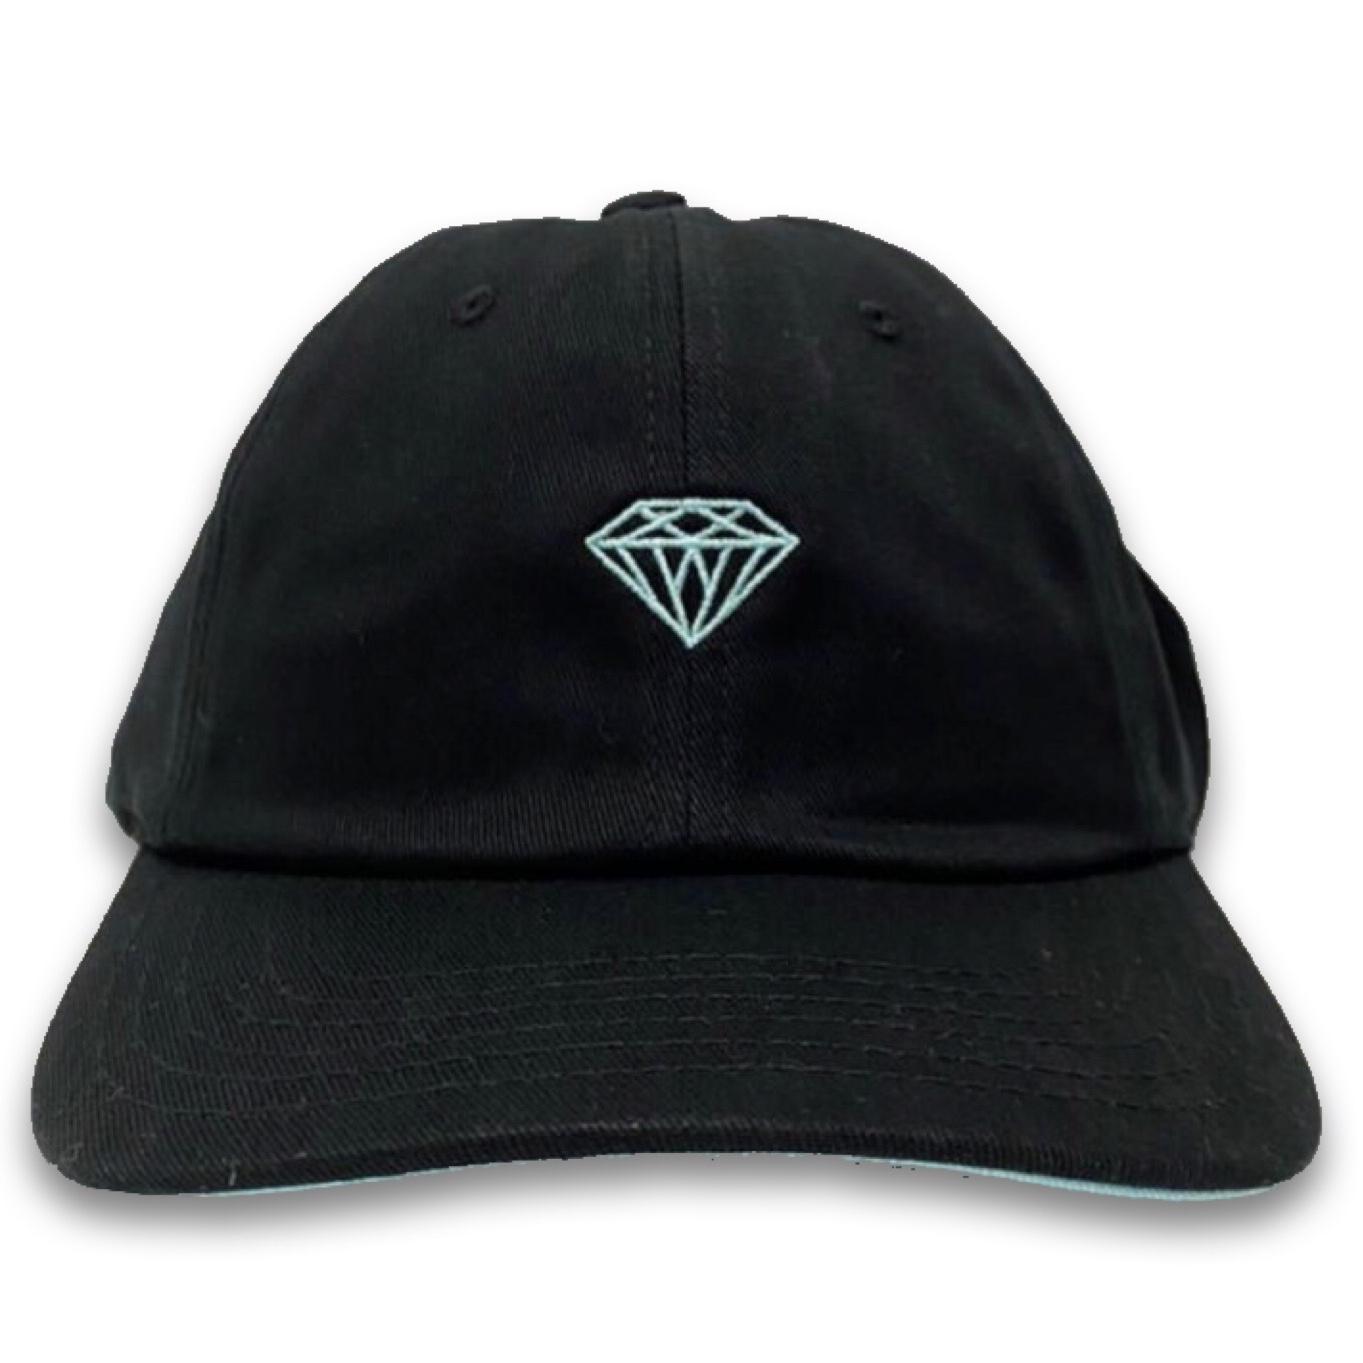 Boné Dad Hat Diamond x Willkhalifaman Desestruturado Aba Curva Preto